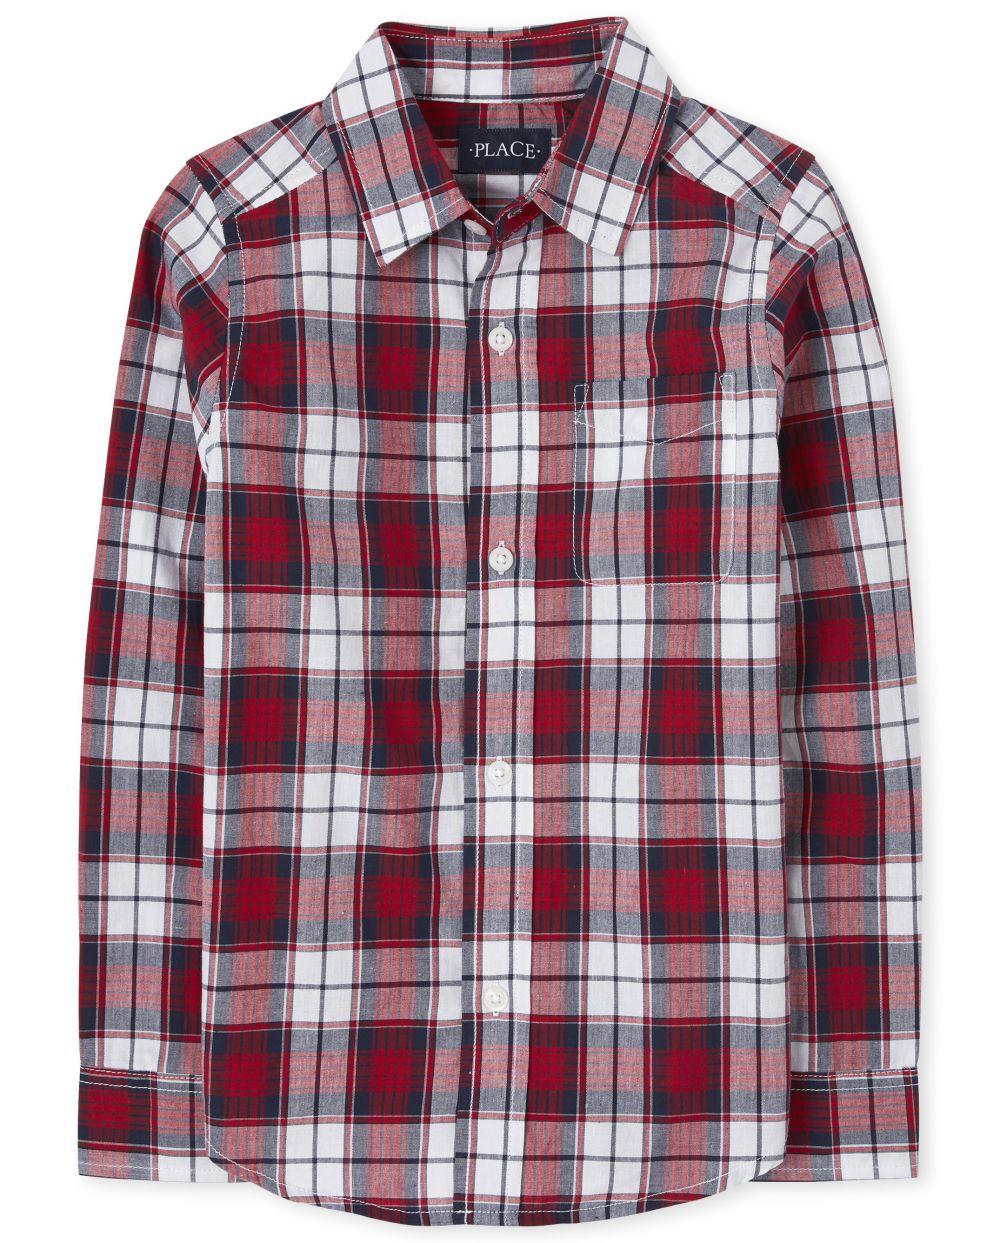 Boys Plaid Poplin Button Down Shirt